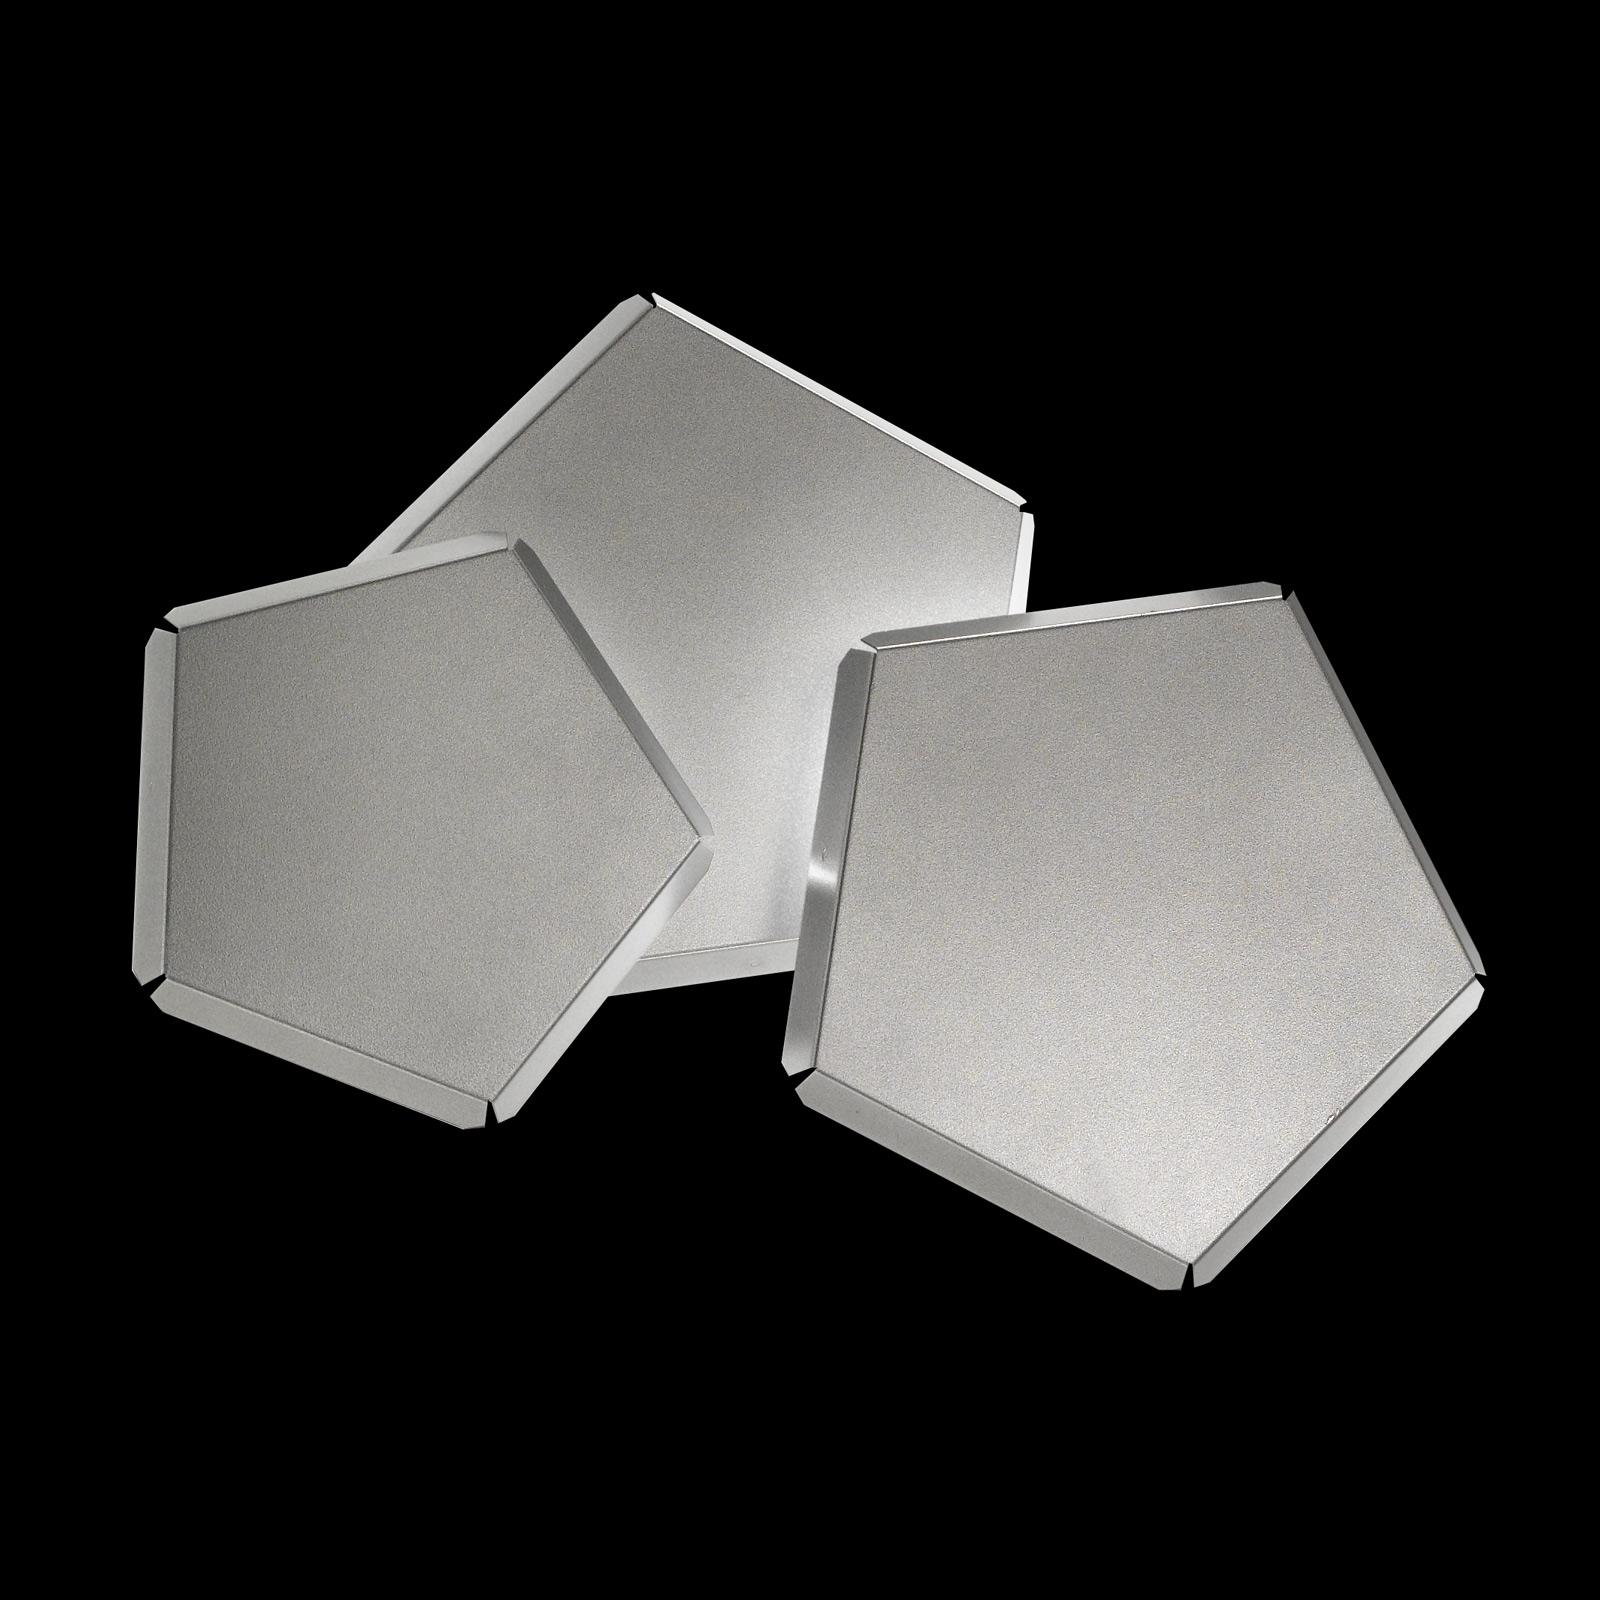 LED-Wandleuchte Pleiadi in Silber, dreiflammig